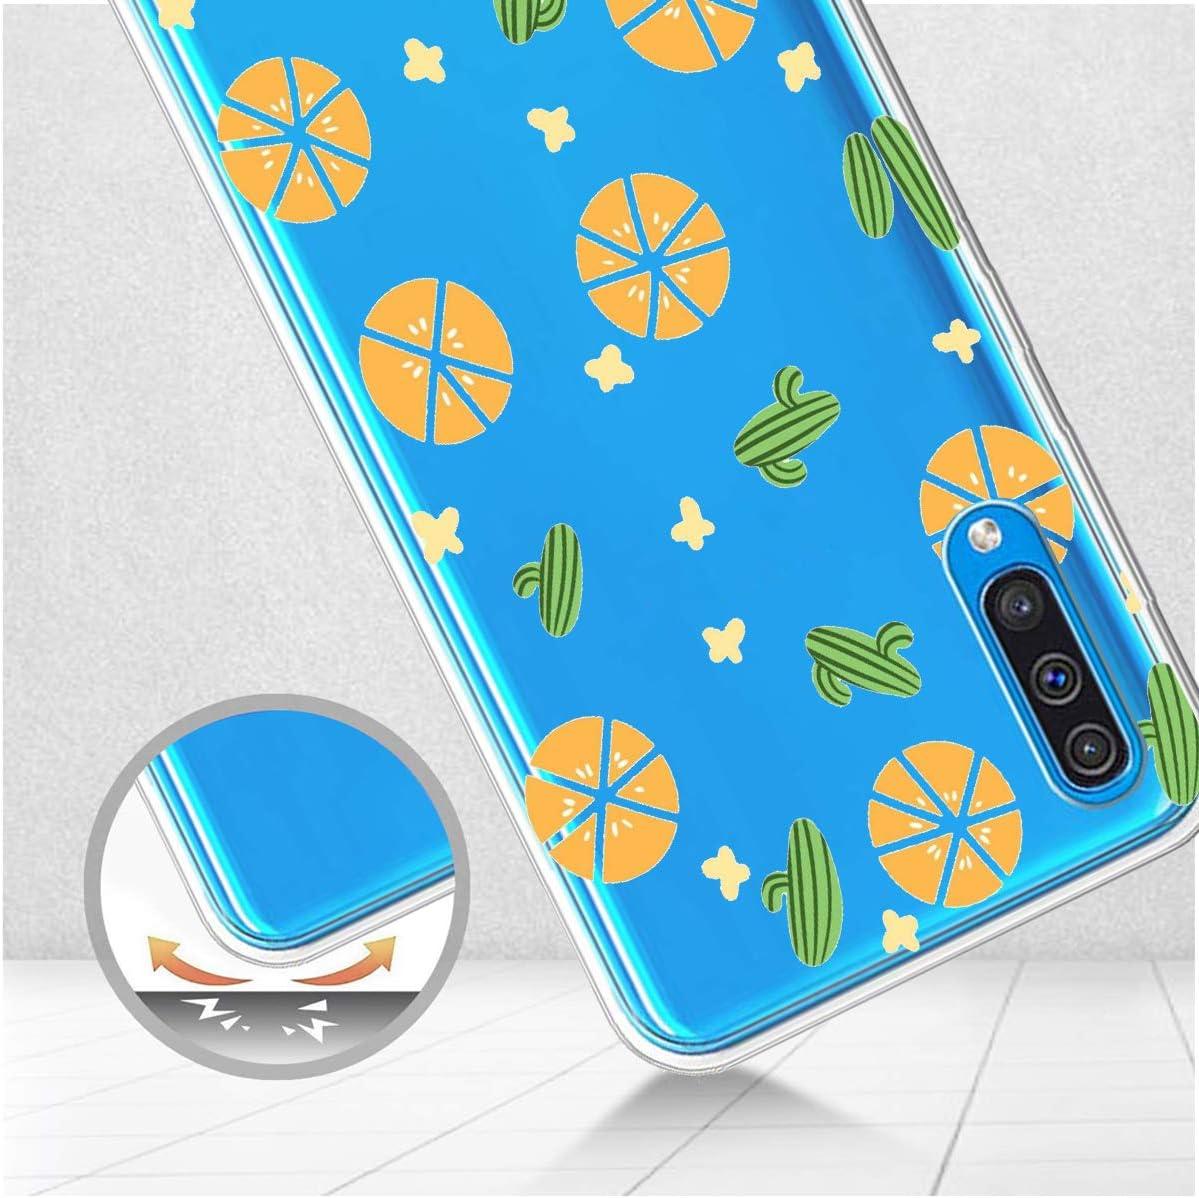 Oihxse Mode Transparent Silicone Case Compatible pour Samsung Galaxy A2 Core Coque Ultra Mince Souple TPU Mignon Animal S/érie Protection de Housse Anti-Scrach Bumper Etui Renard